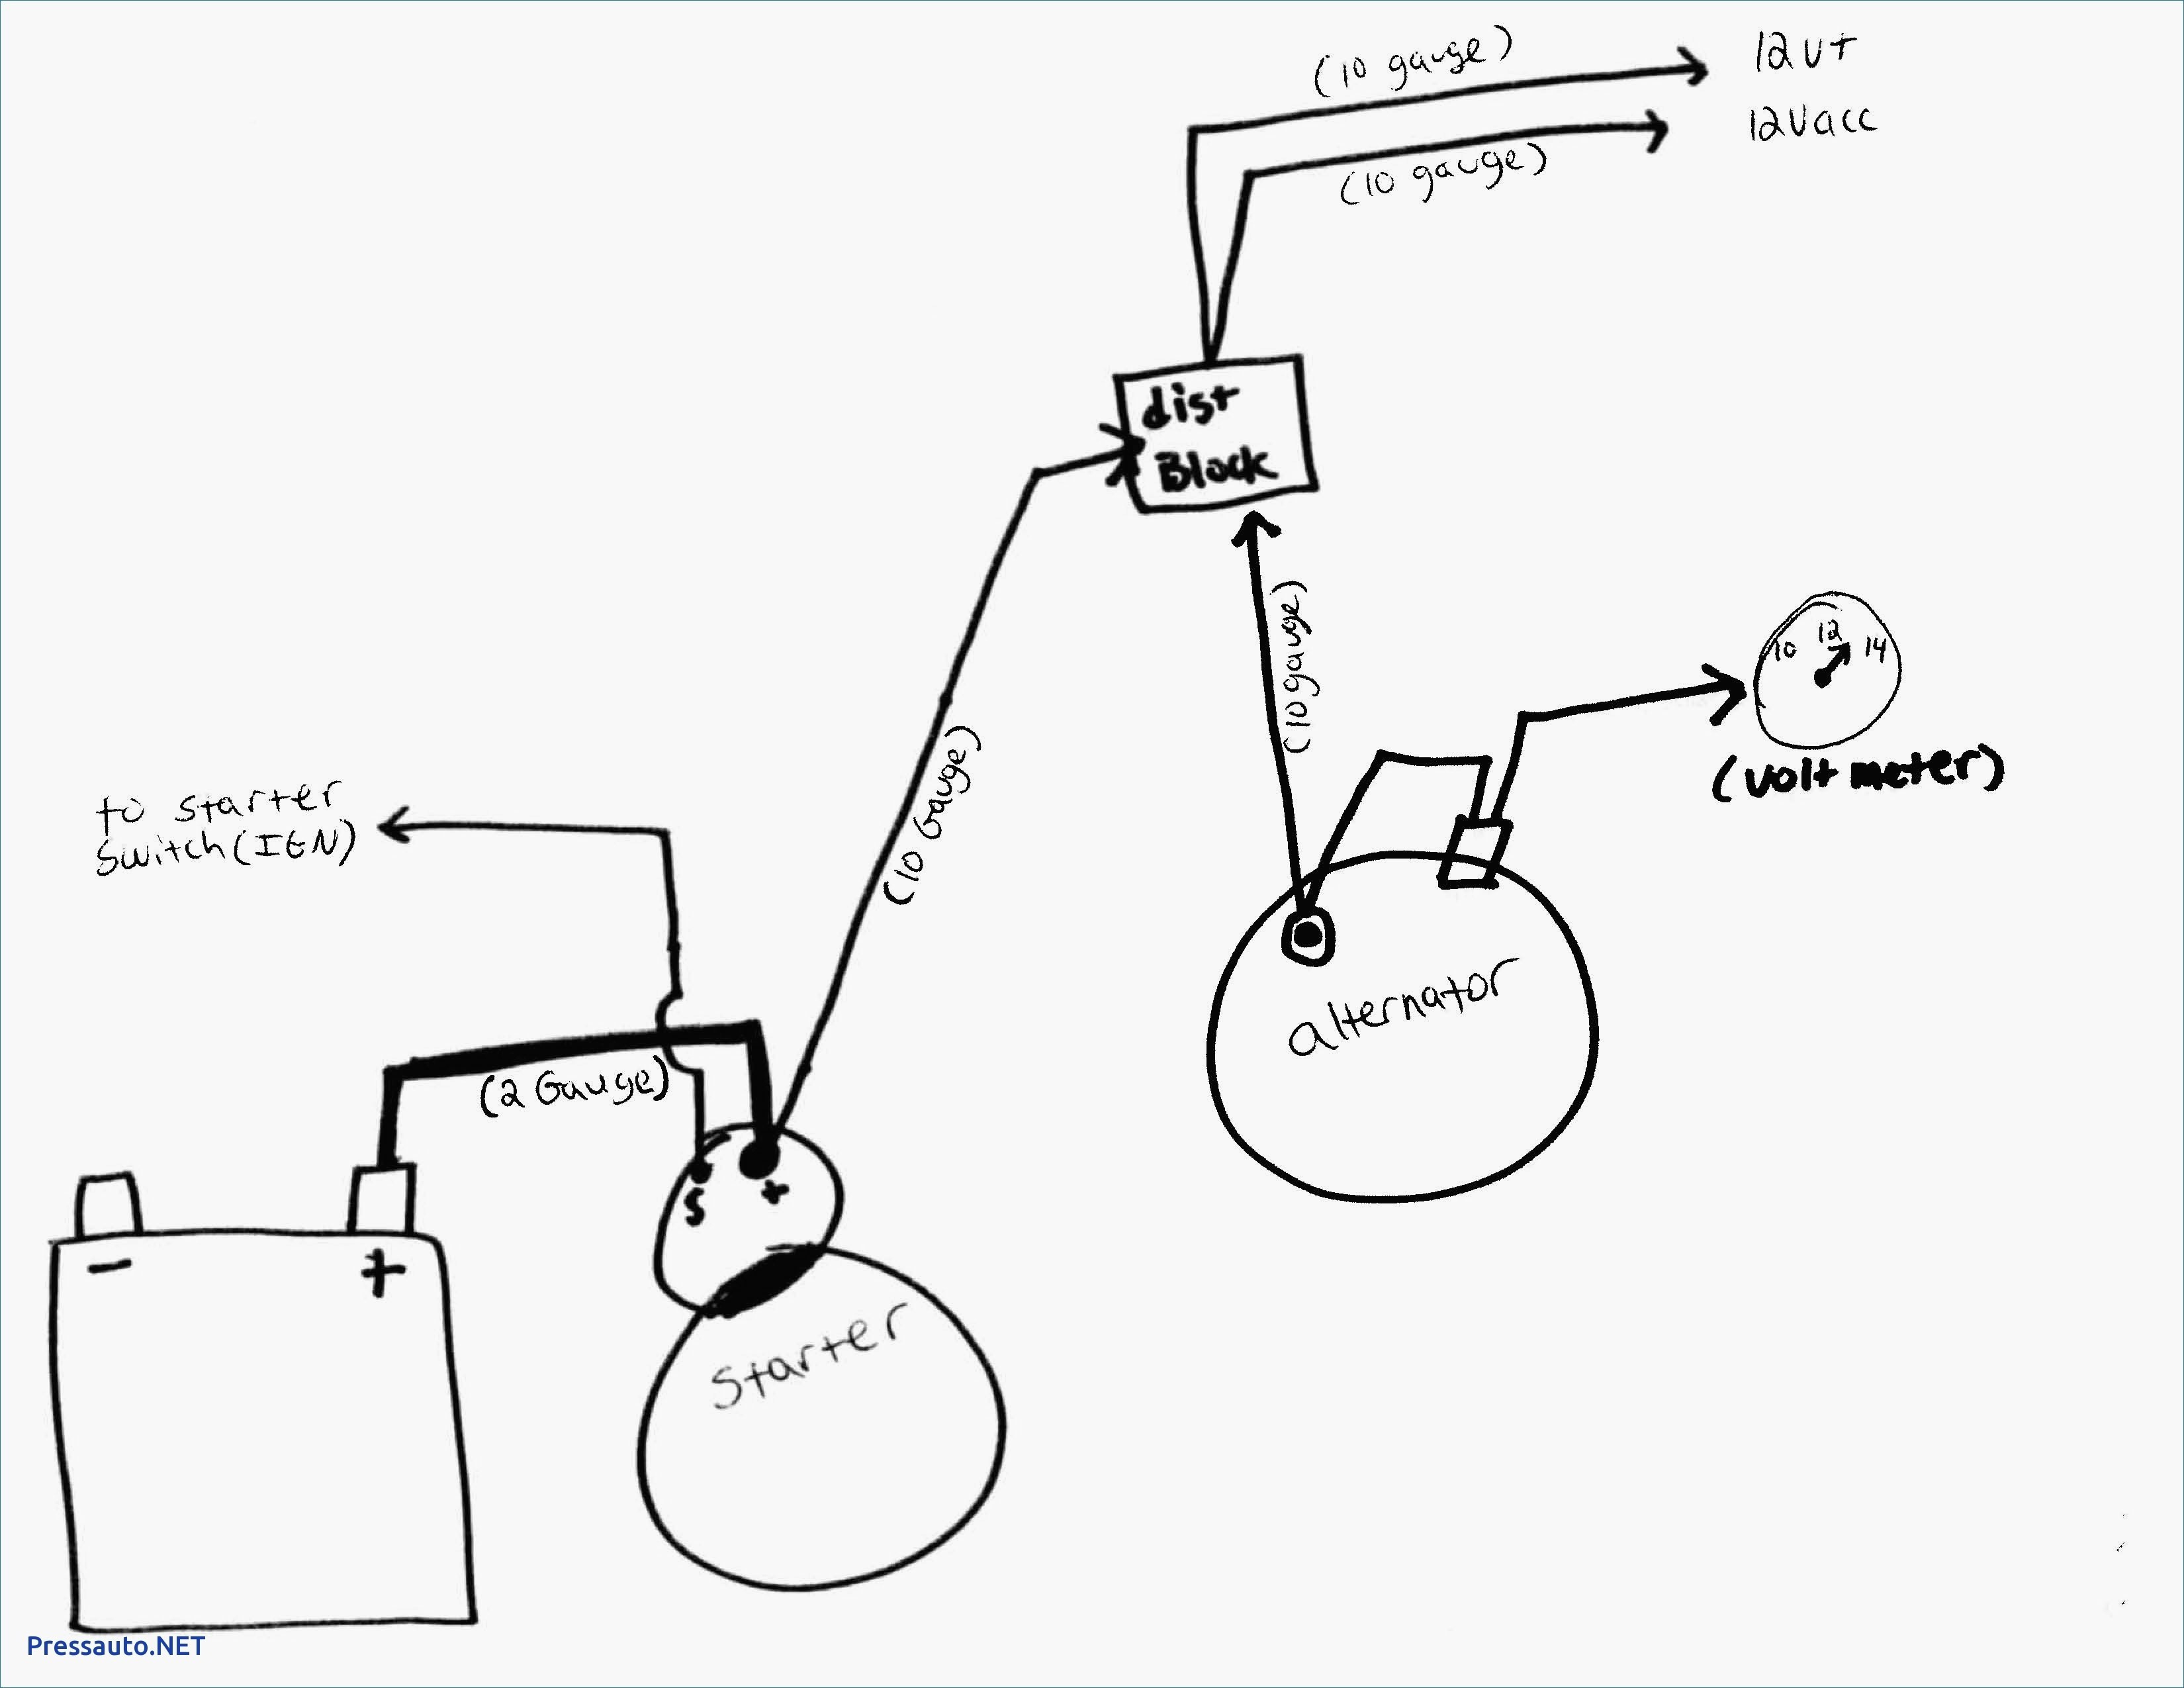 One Wire Alternator Wiring Diagram Chevy - Wiring Block Diagram - One Wire Alternator Wiring Diagram Chevy